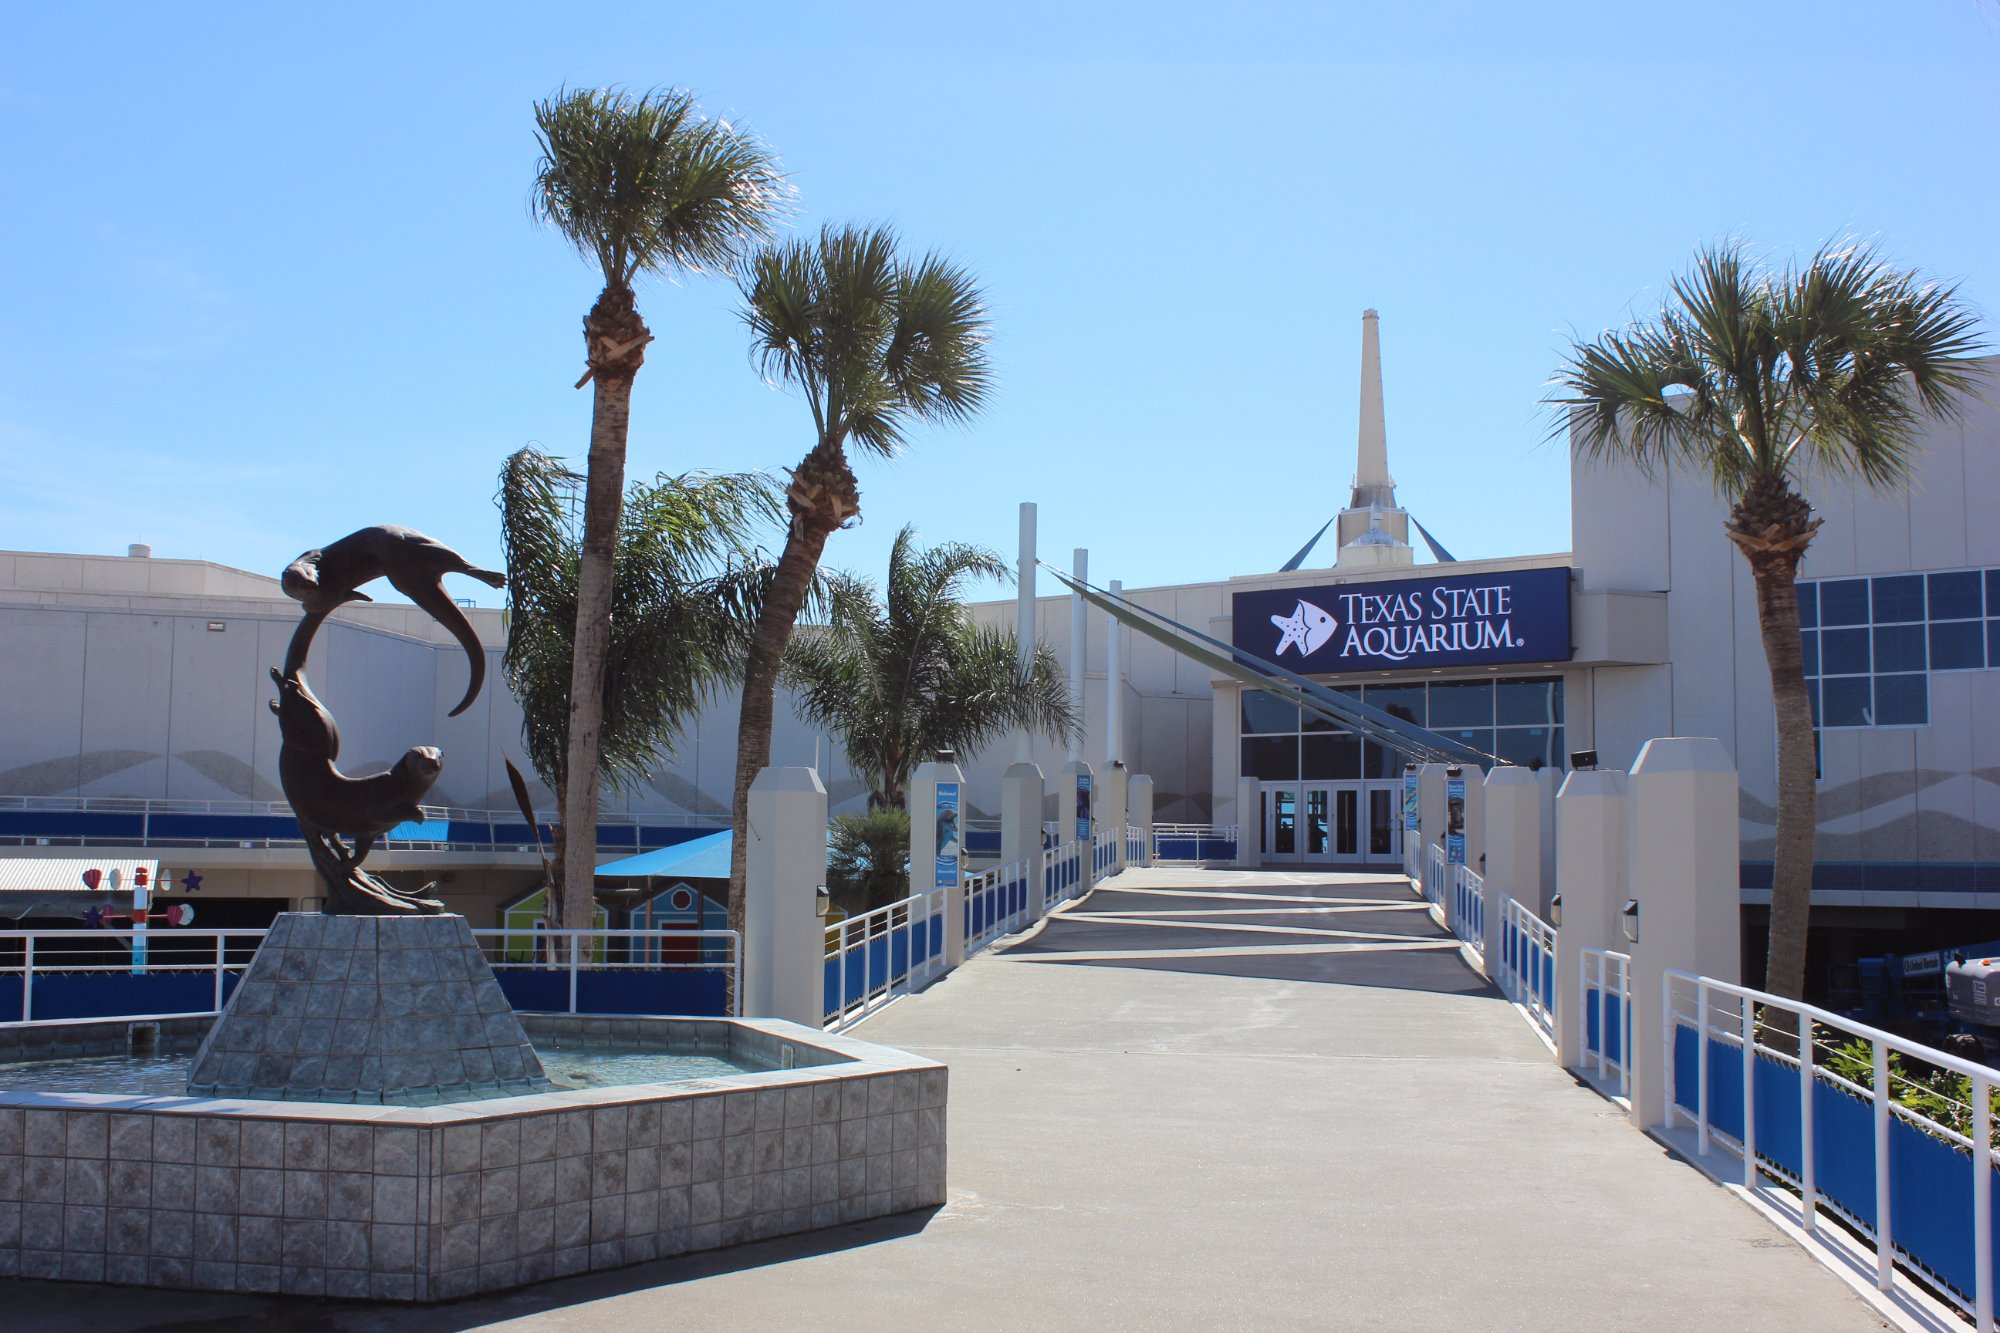 Texas State Aquarium Corpus Christi Top Tips Before You